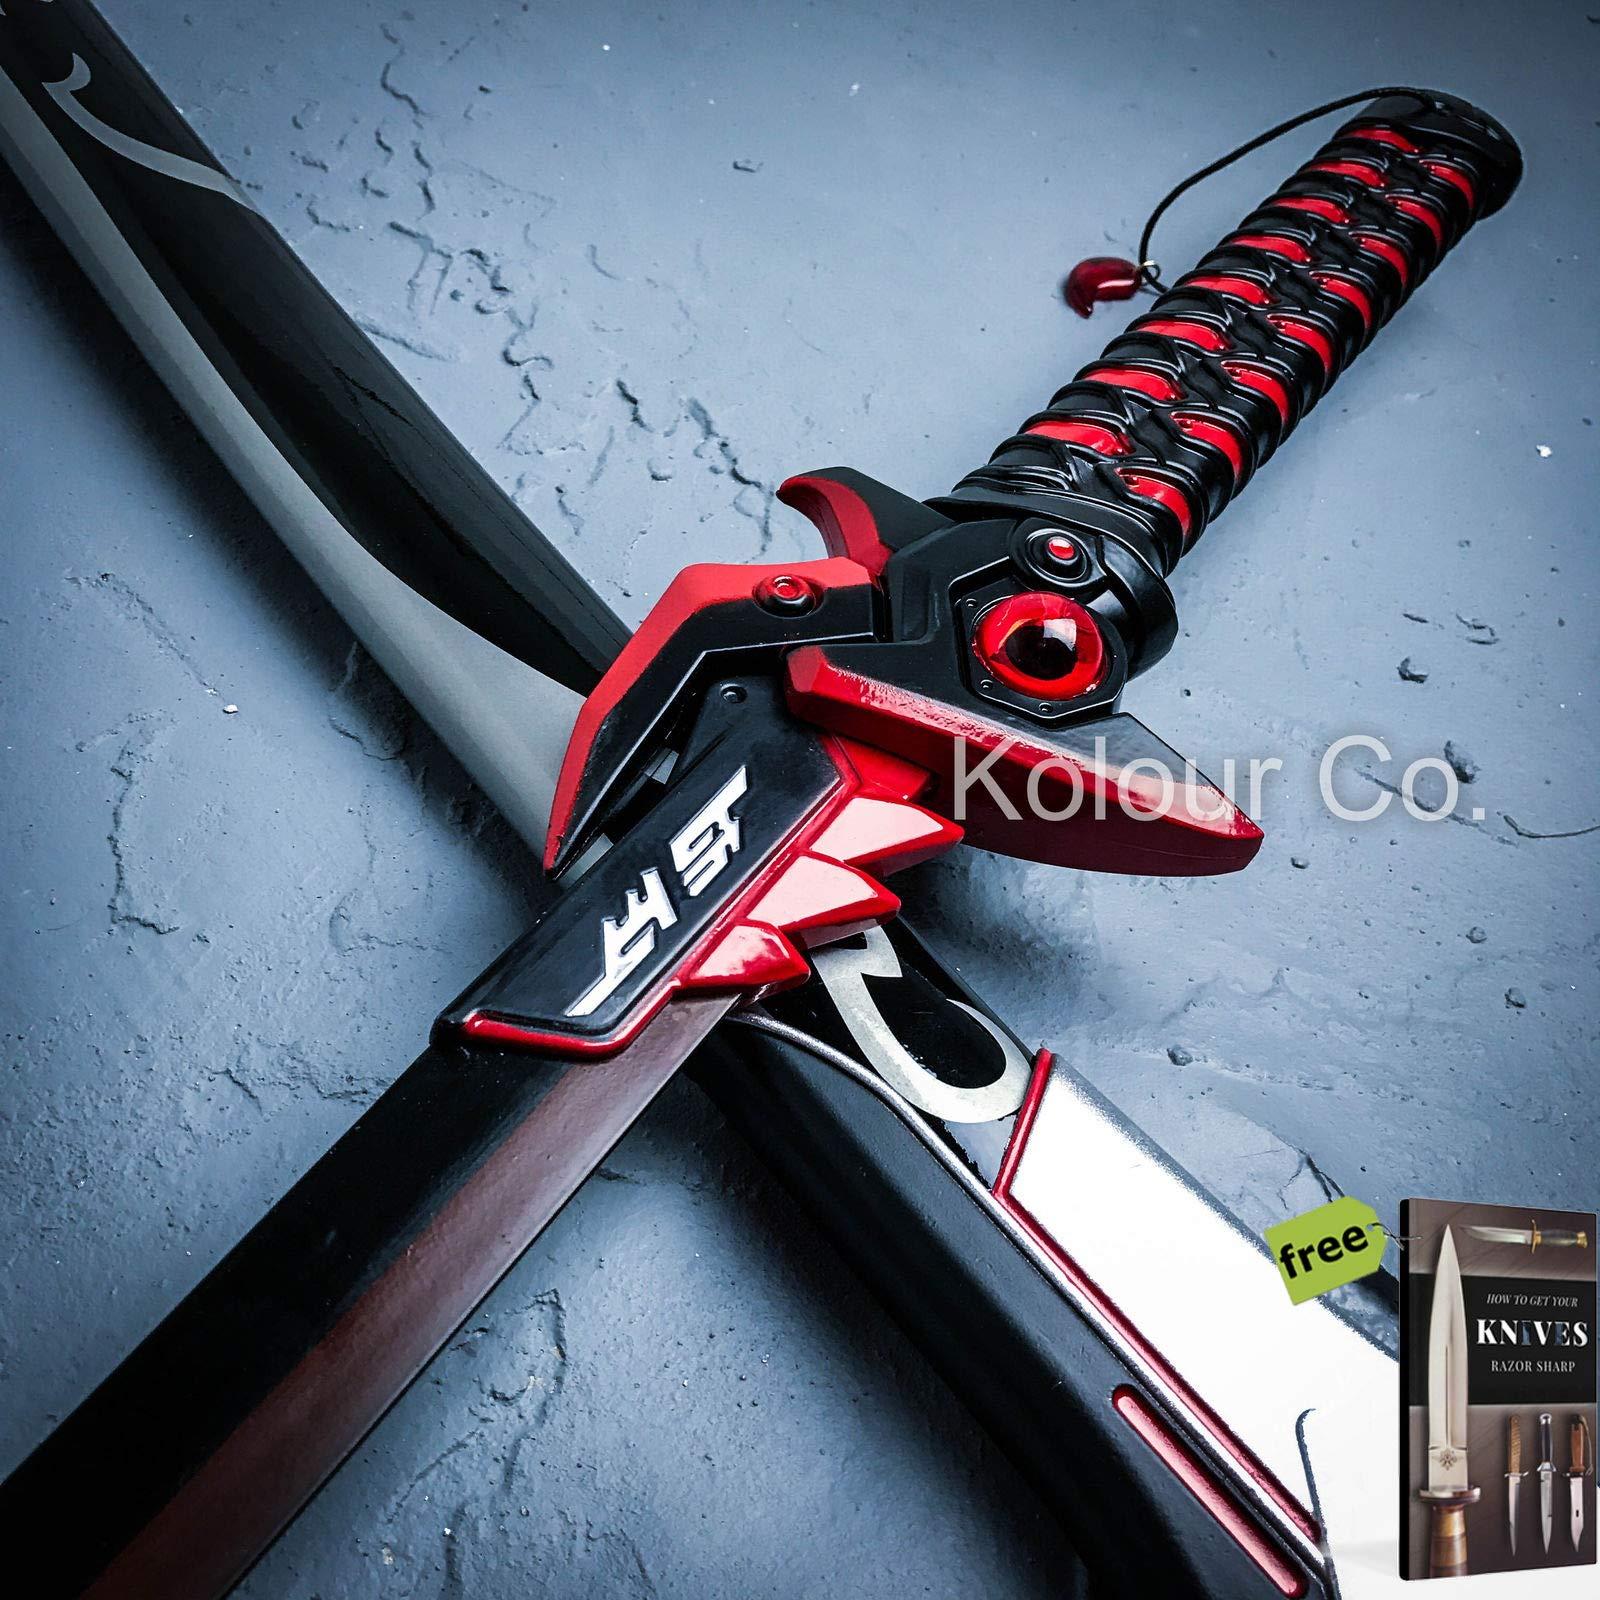 44'' Overwatch Game Genji Oni Metal Sword OW Weapon 1:1 NEW Cosplay LARP Props + Free eBook by SURVIVAL STEEL